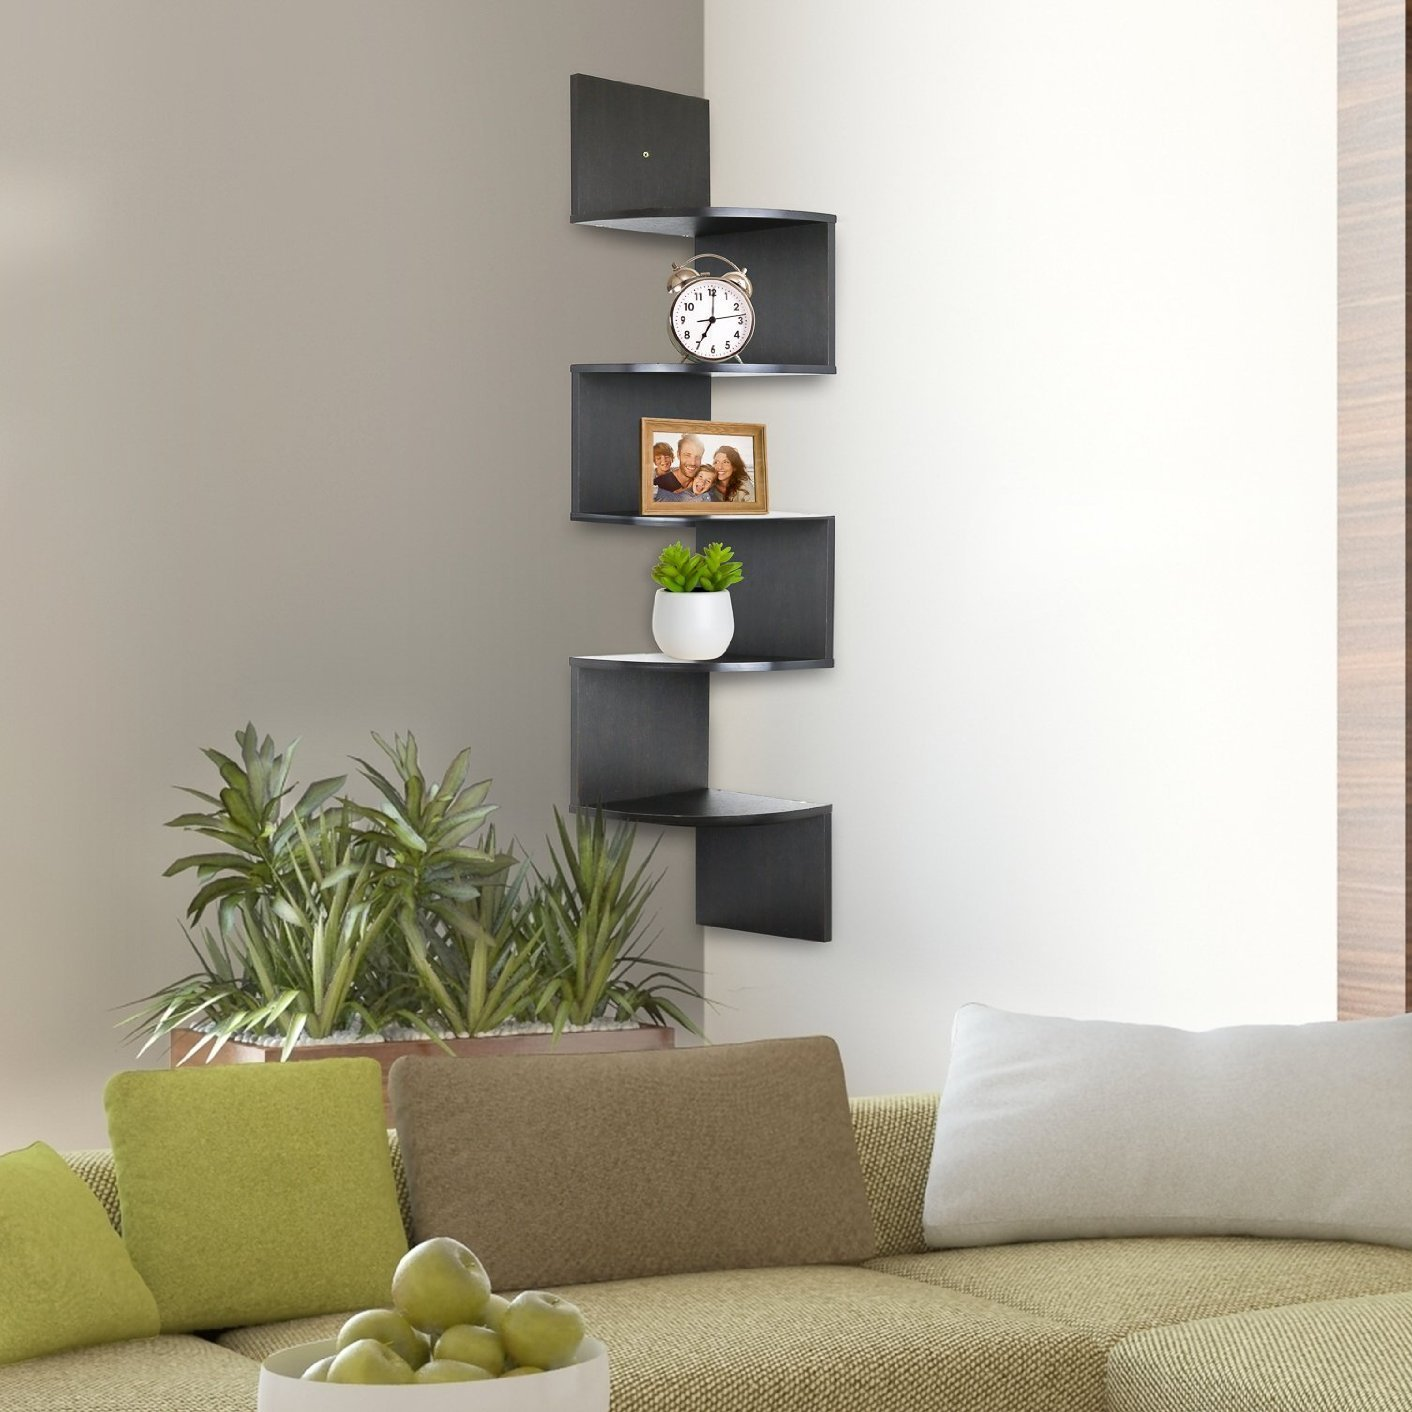 Greenco 5 Tier Wall Mount Corner Shelves Only 1889 Reg 2999